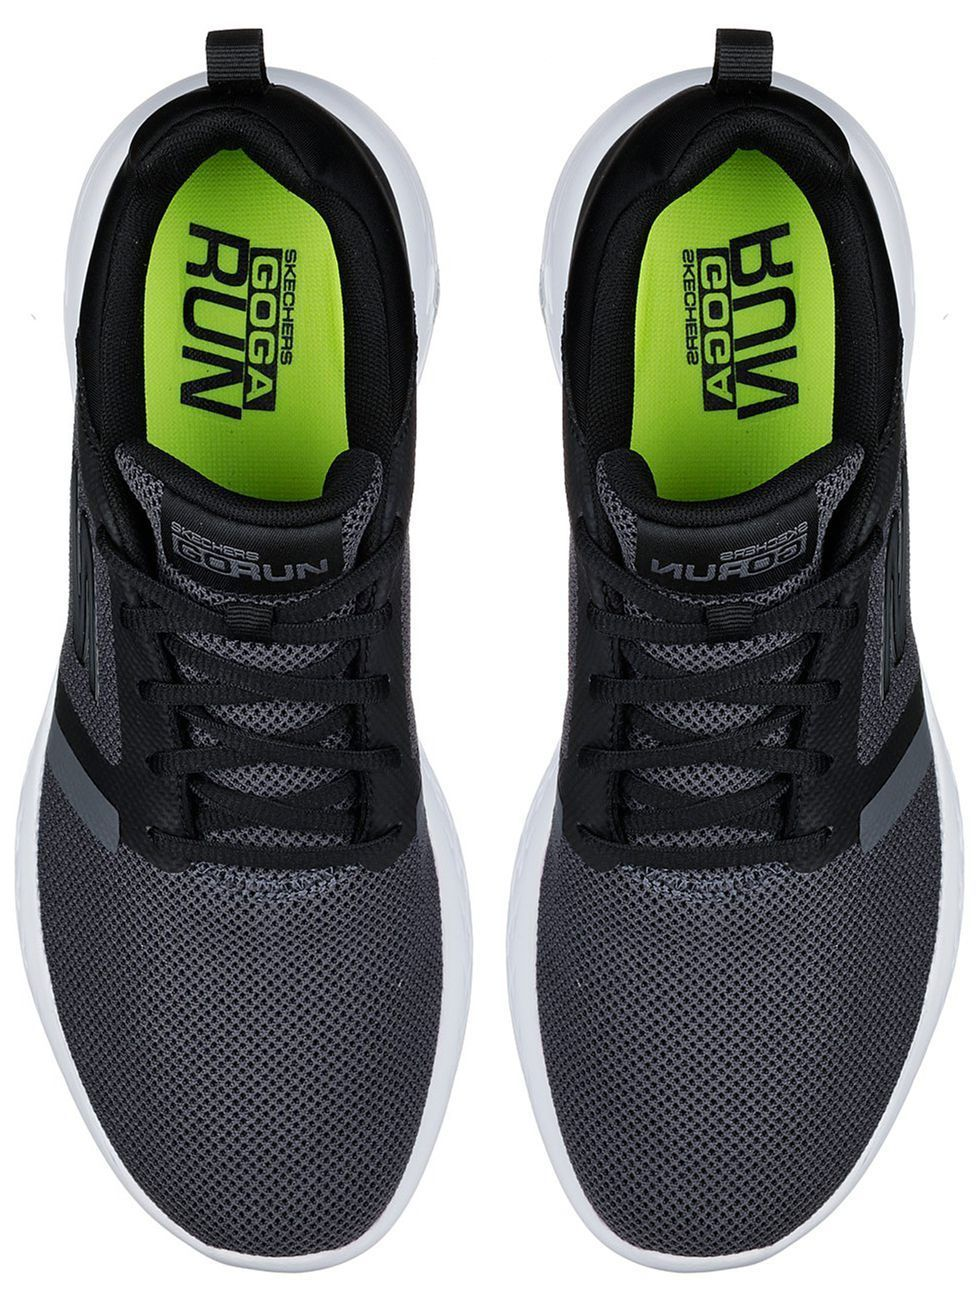 Кроссовки для мужчин Skechers GO KM2805 размеры обуви, 2017